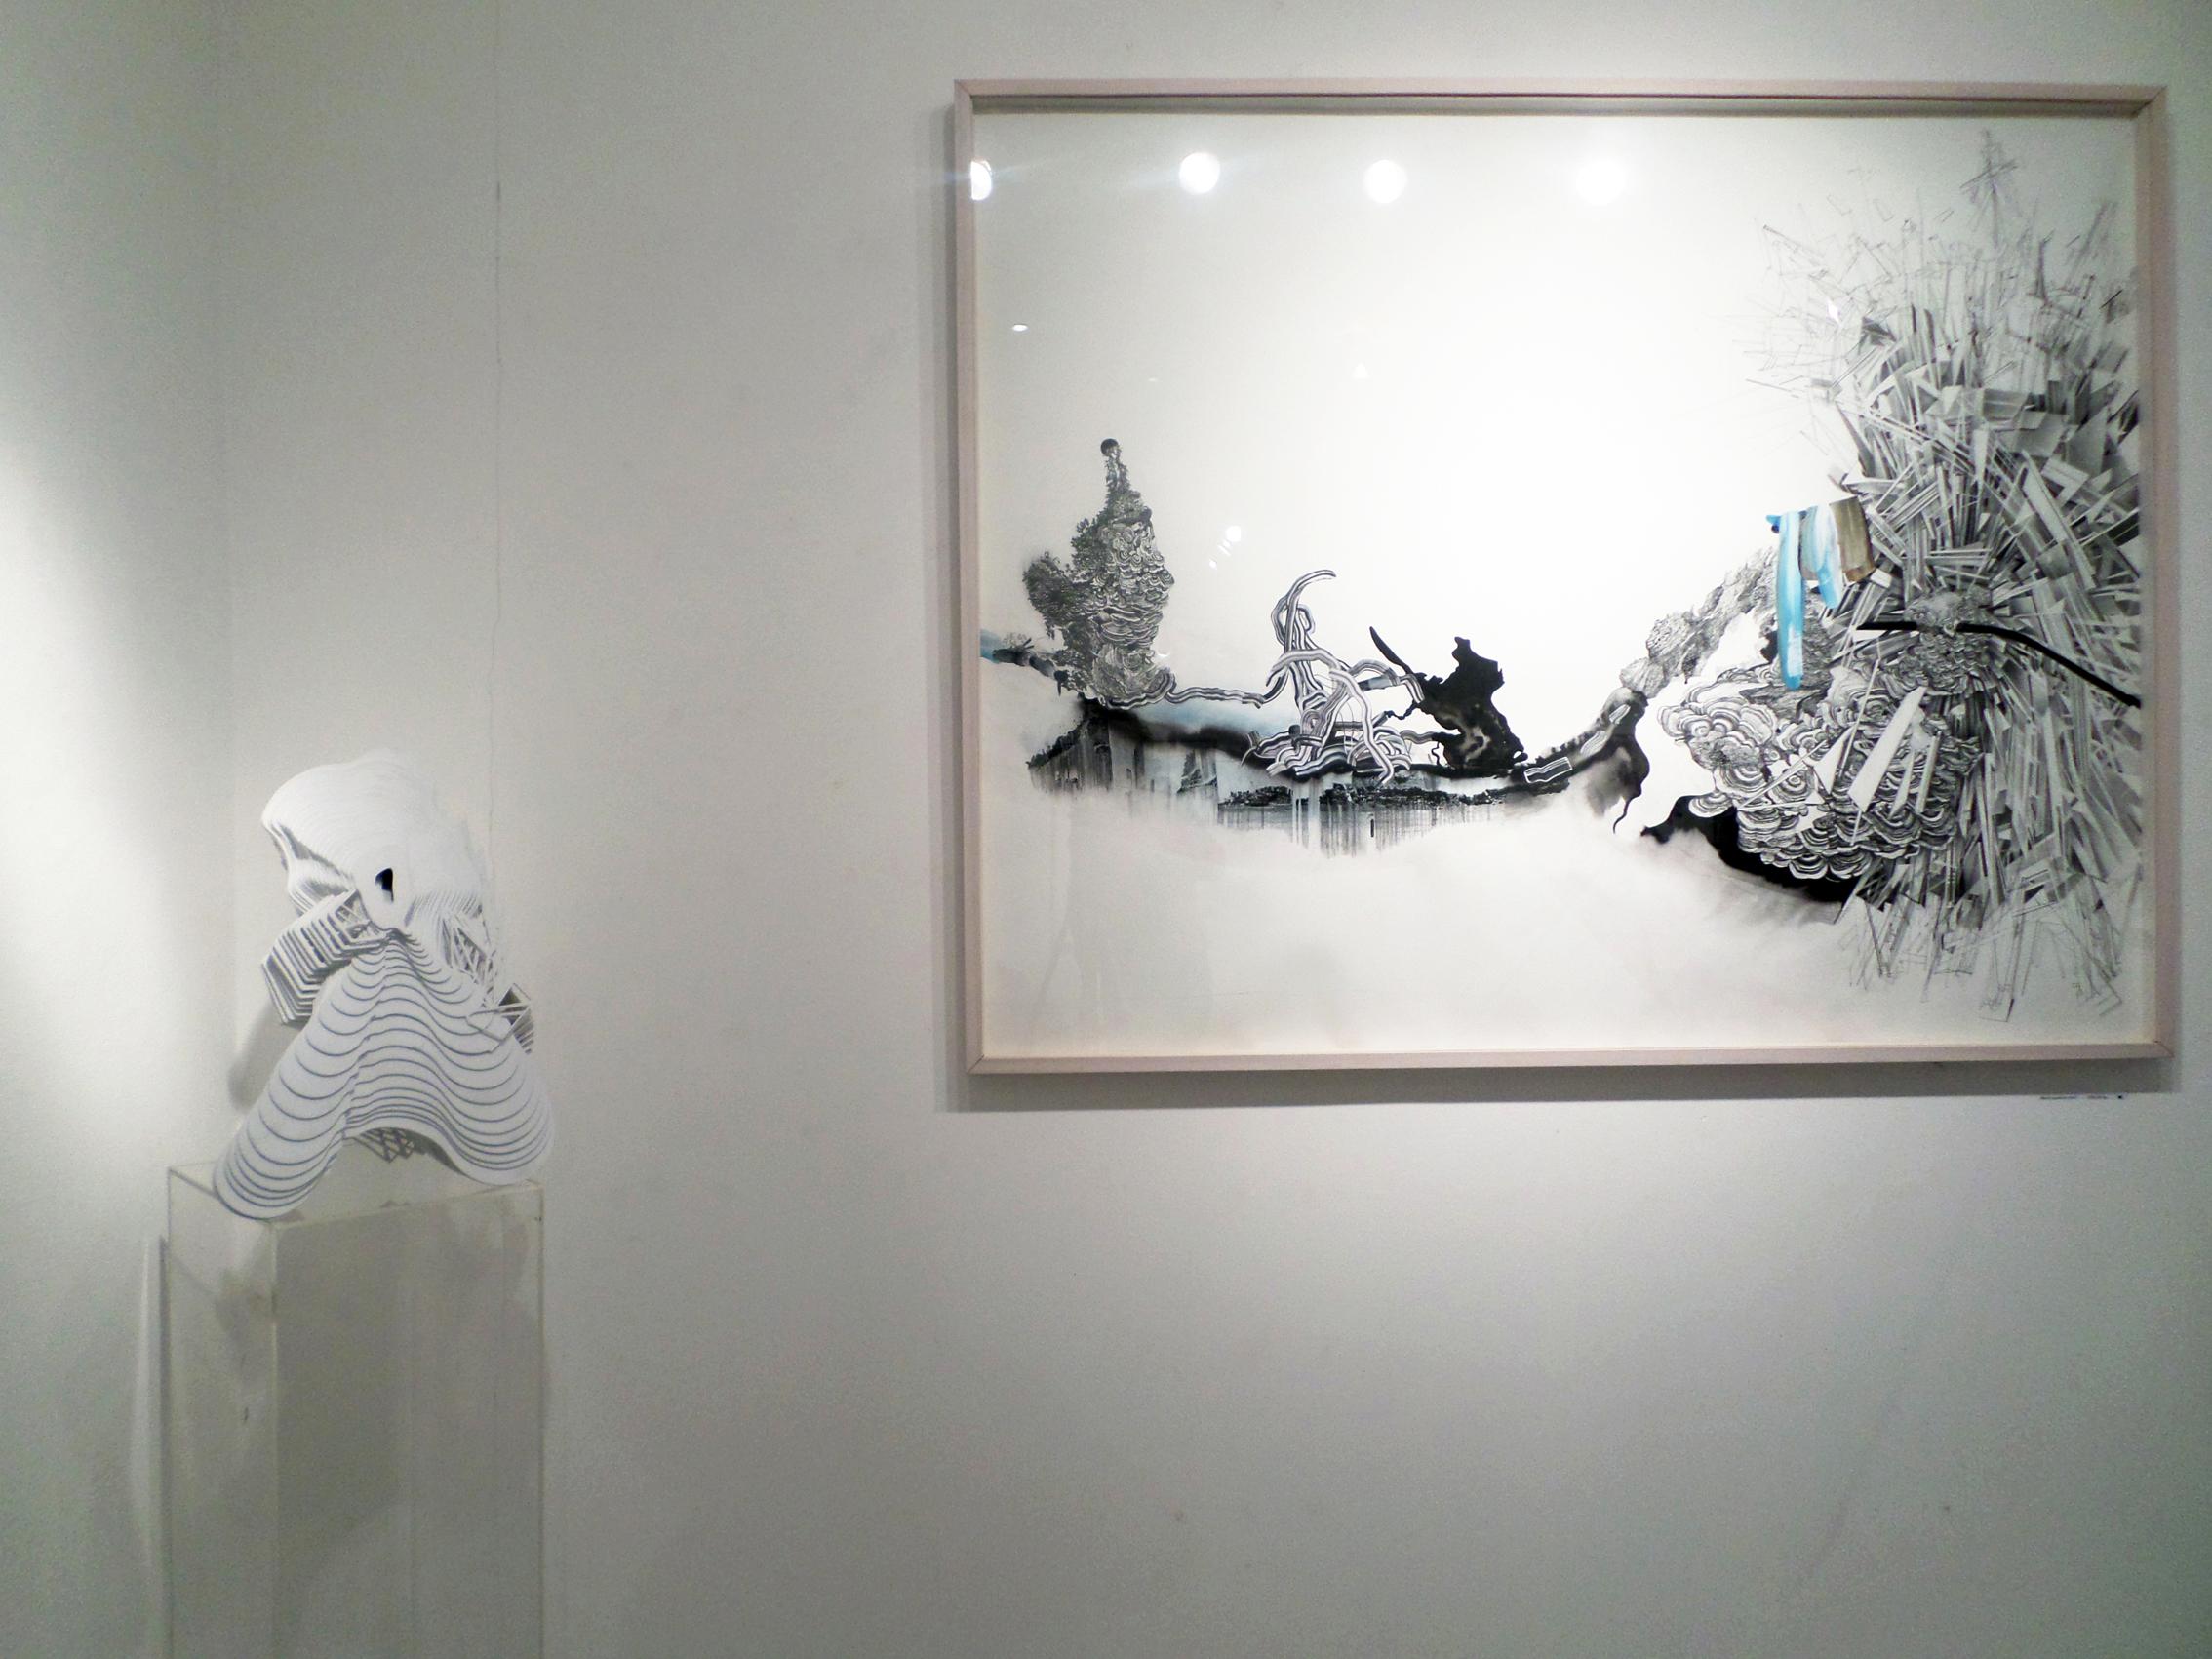 Zina Athanassiadou gallery exhibition view1 (3).jpg